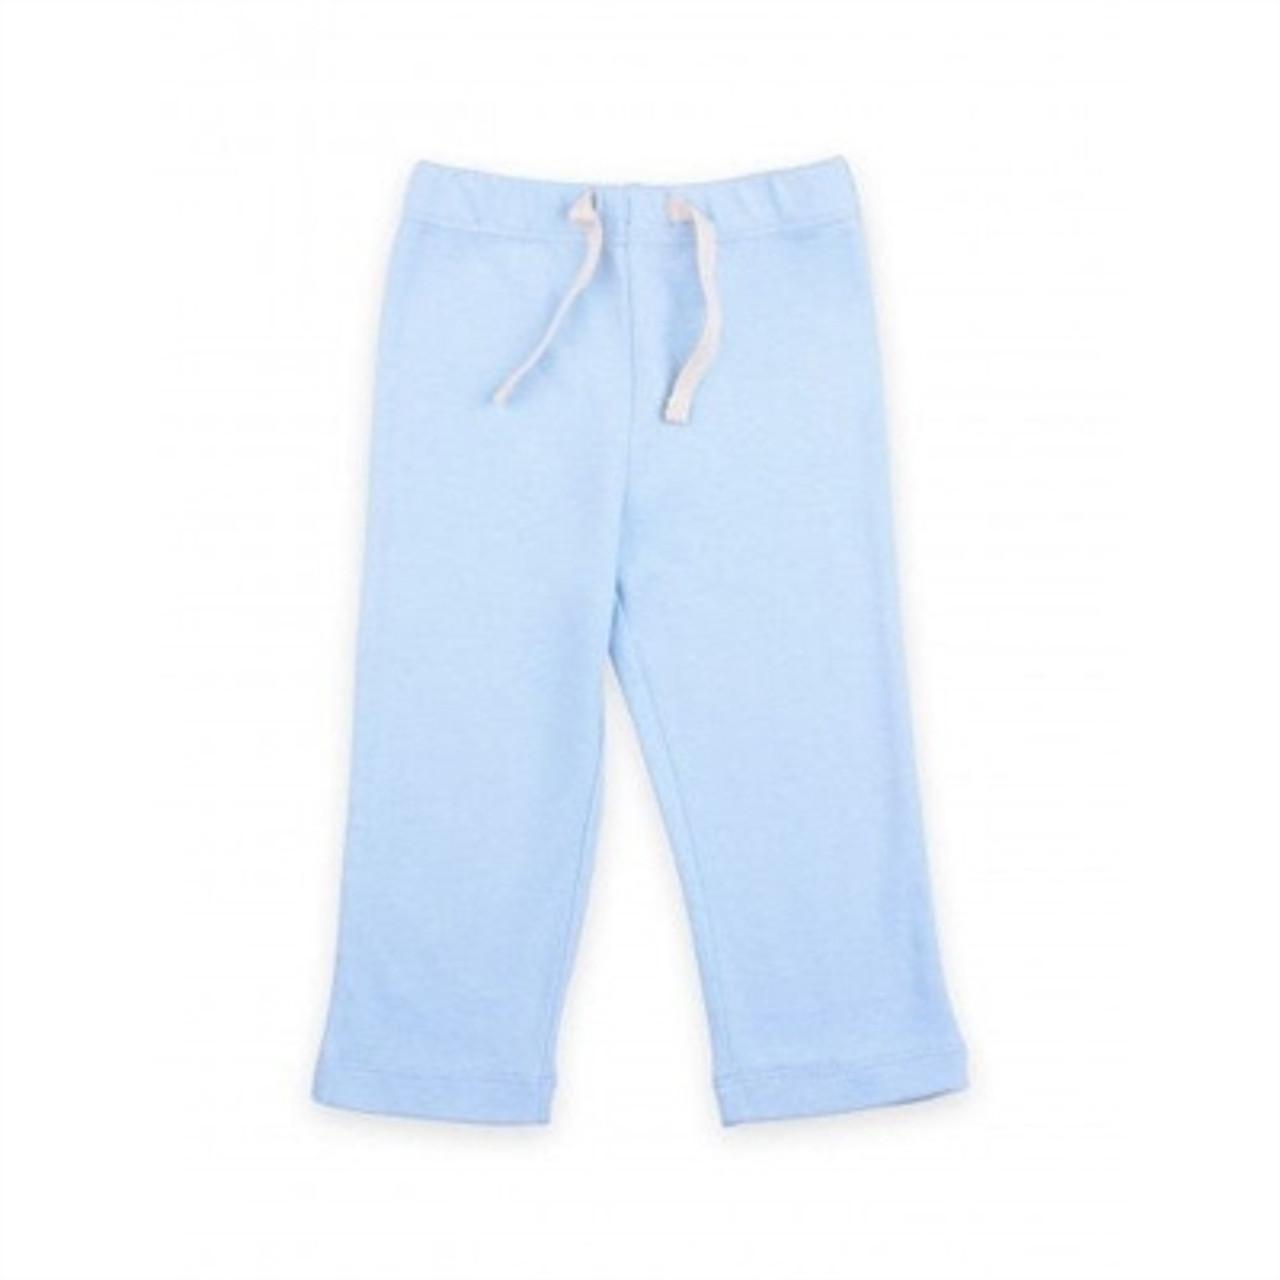 Organic Baby Yoga Pants - 0-3 Months - Blue